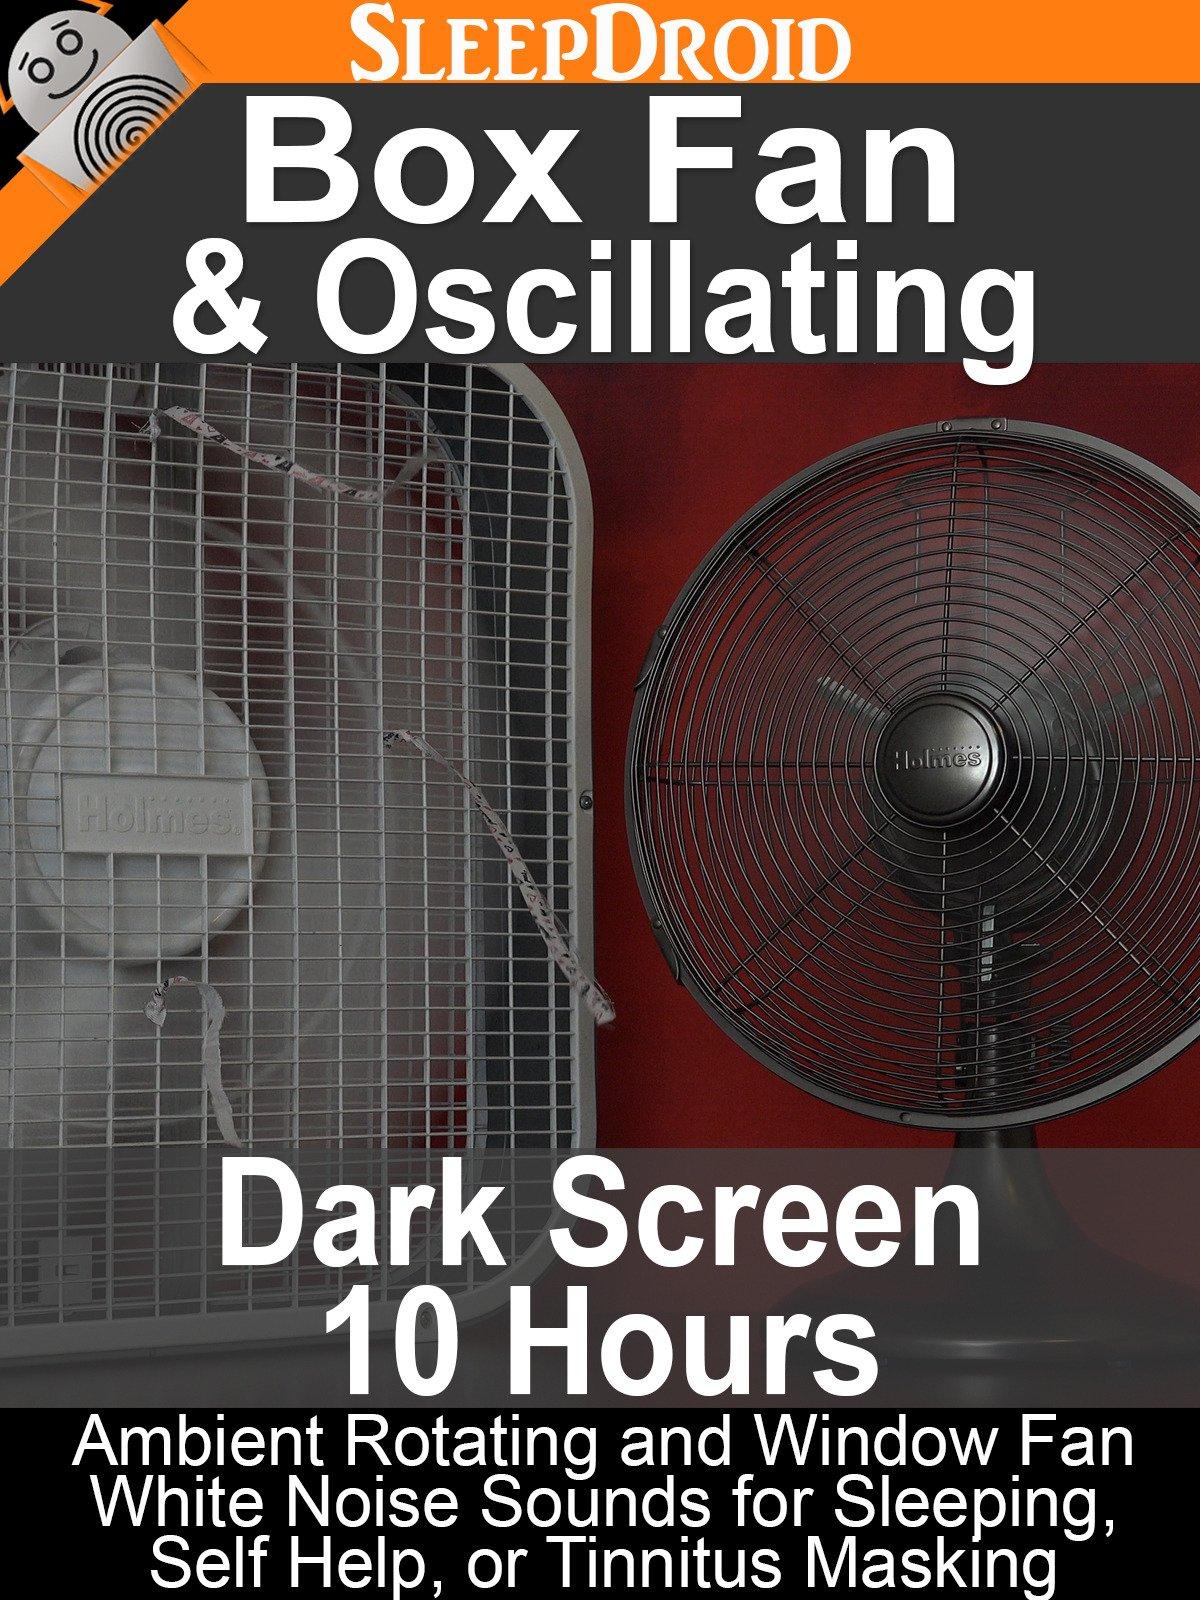 Box Fan and Oscillating (Dark Screen